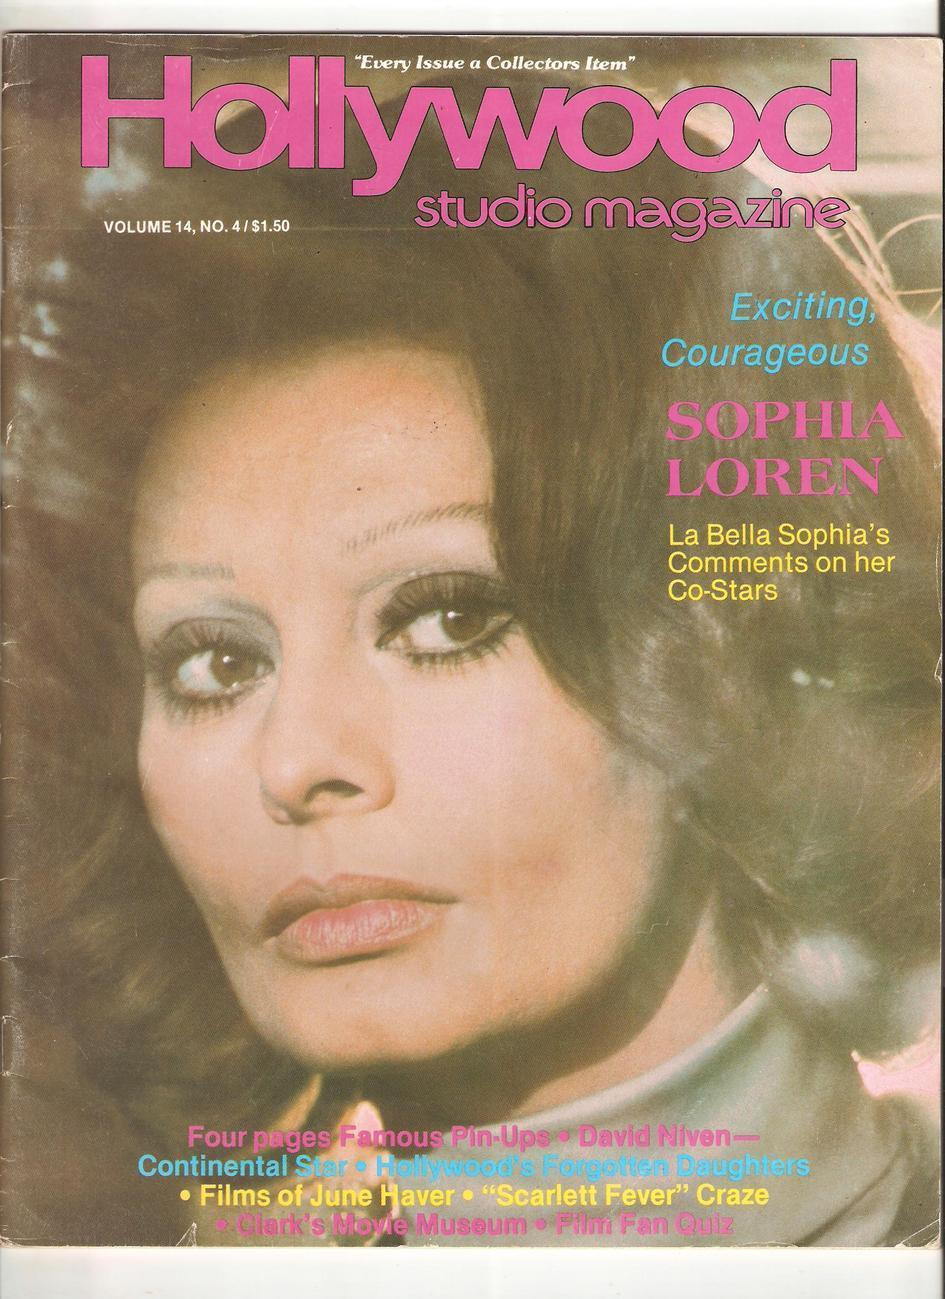 Hollywoodstudiomagazine oct.1980